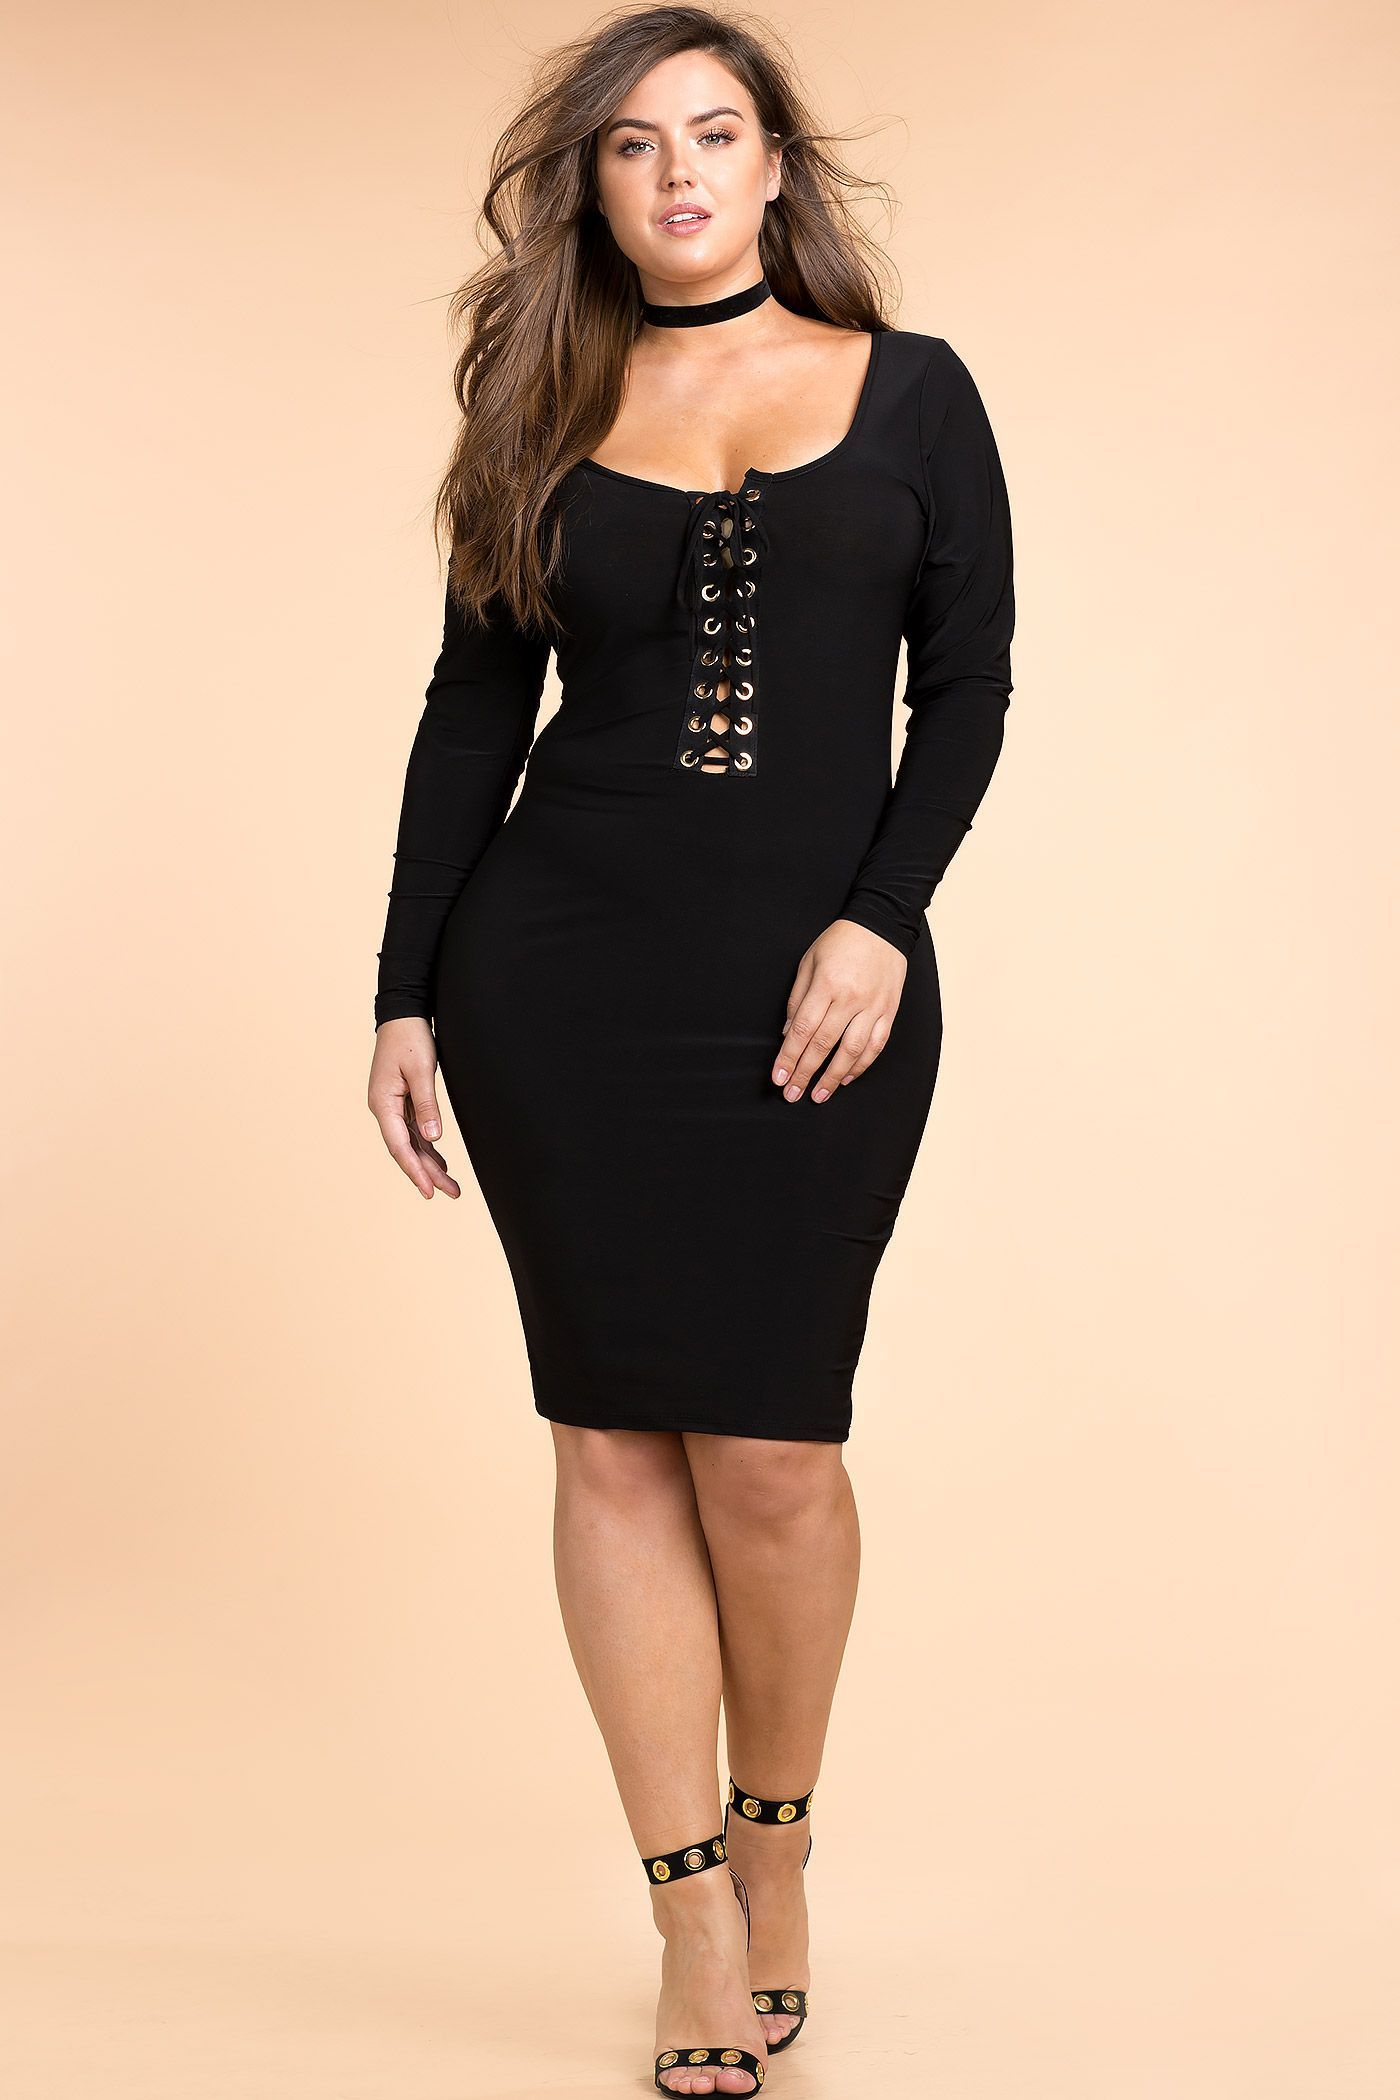 Womens Plus Size Bodycon Dresses  Plunge Lace Up Bodycon -1200